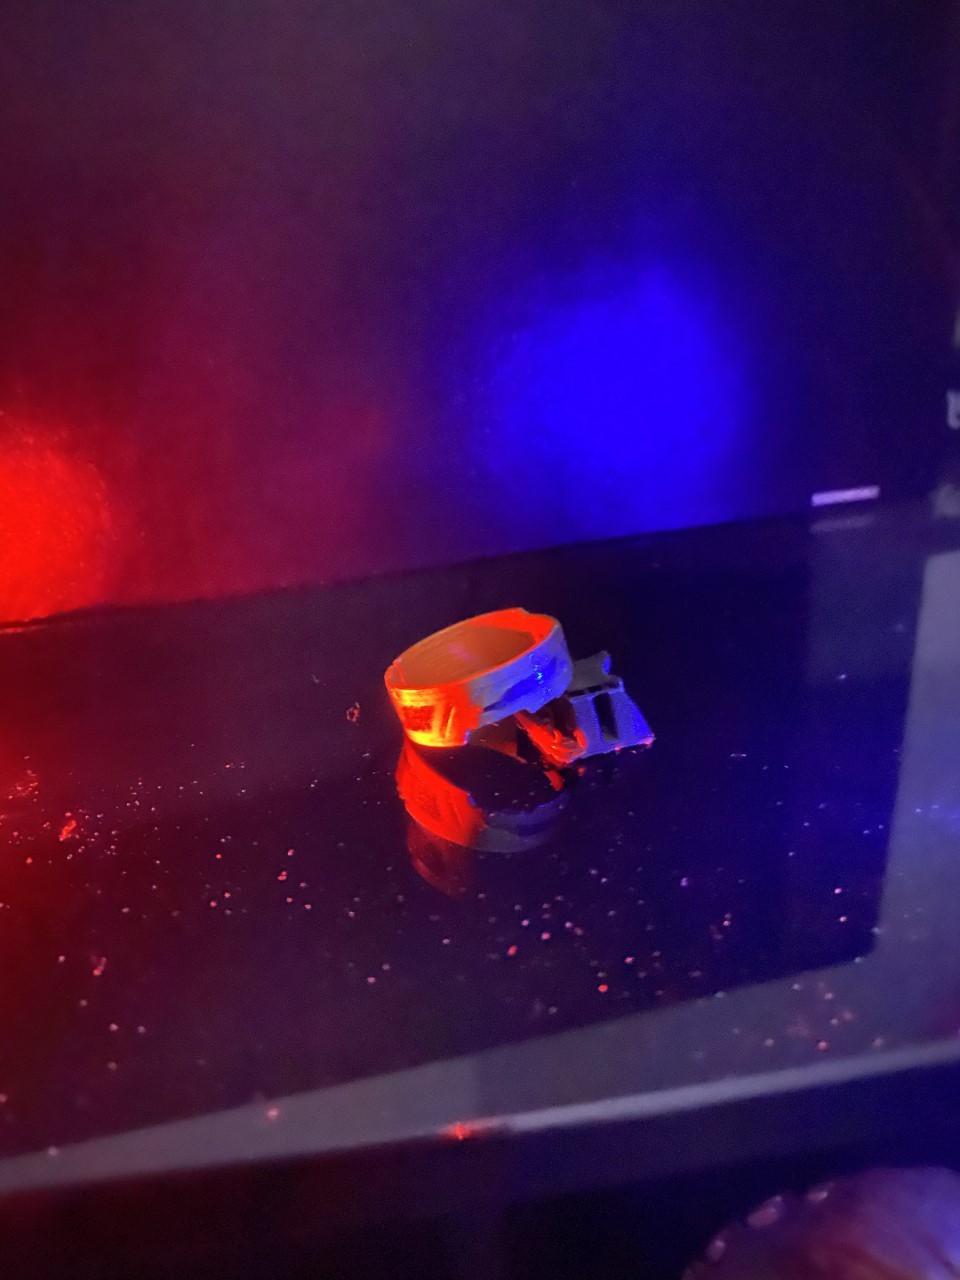 bague cyberpunk.jpg Télécharger fichier STL gratuit Bague inspirée de Cyberpunk • Design imprimable en 3D, Arock56